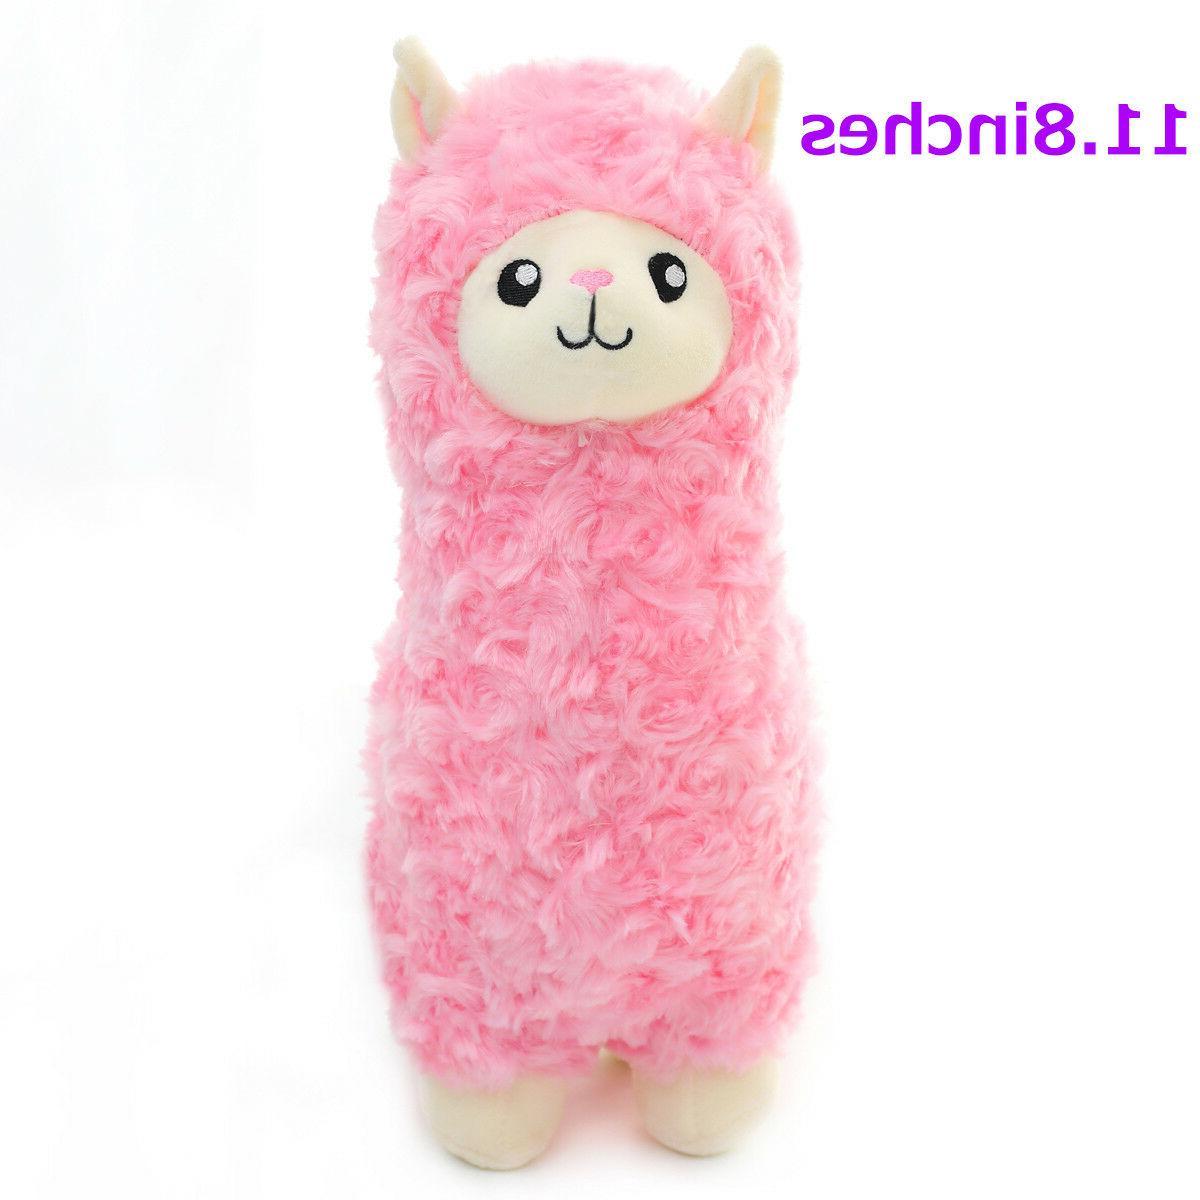 "Winsterch 11.8"" Plush Stuffed Animals Llama Alpaca Cute Plus"